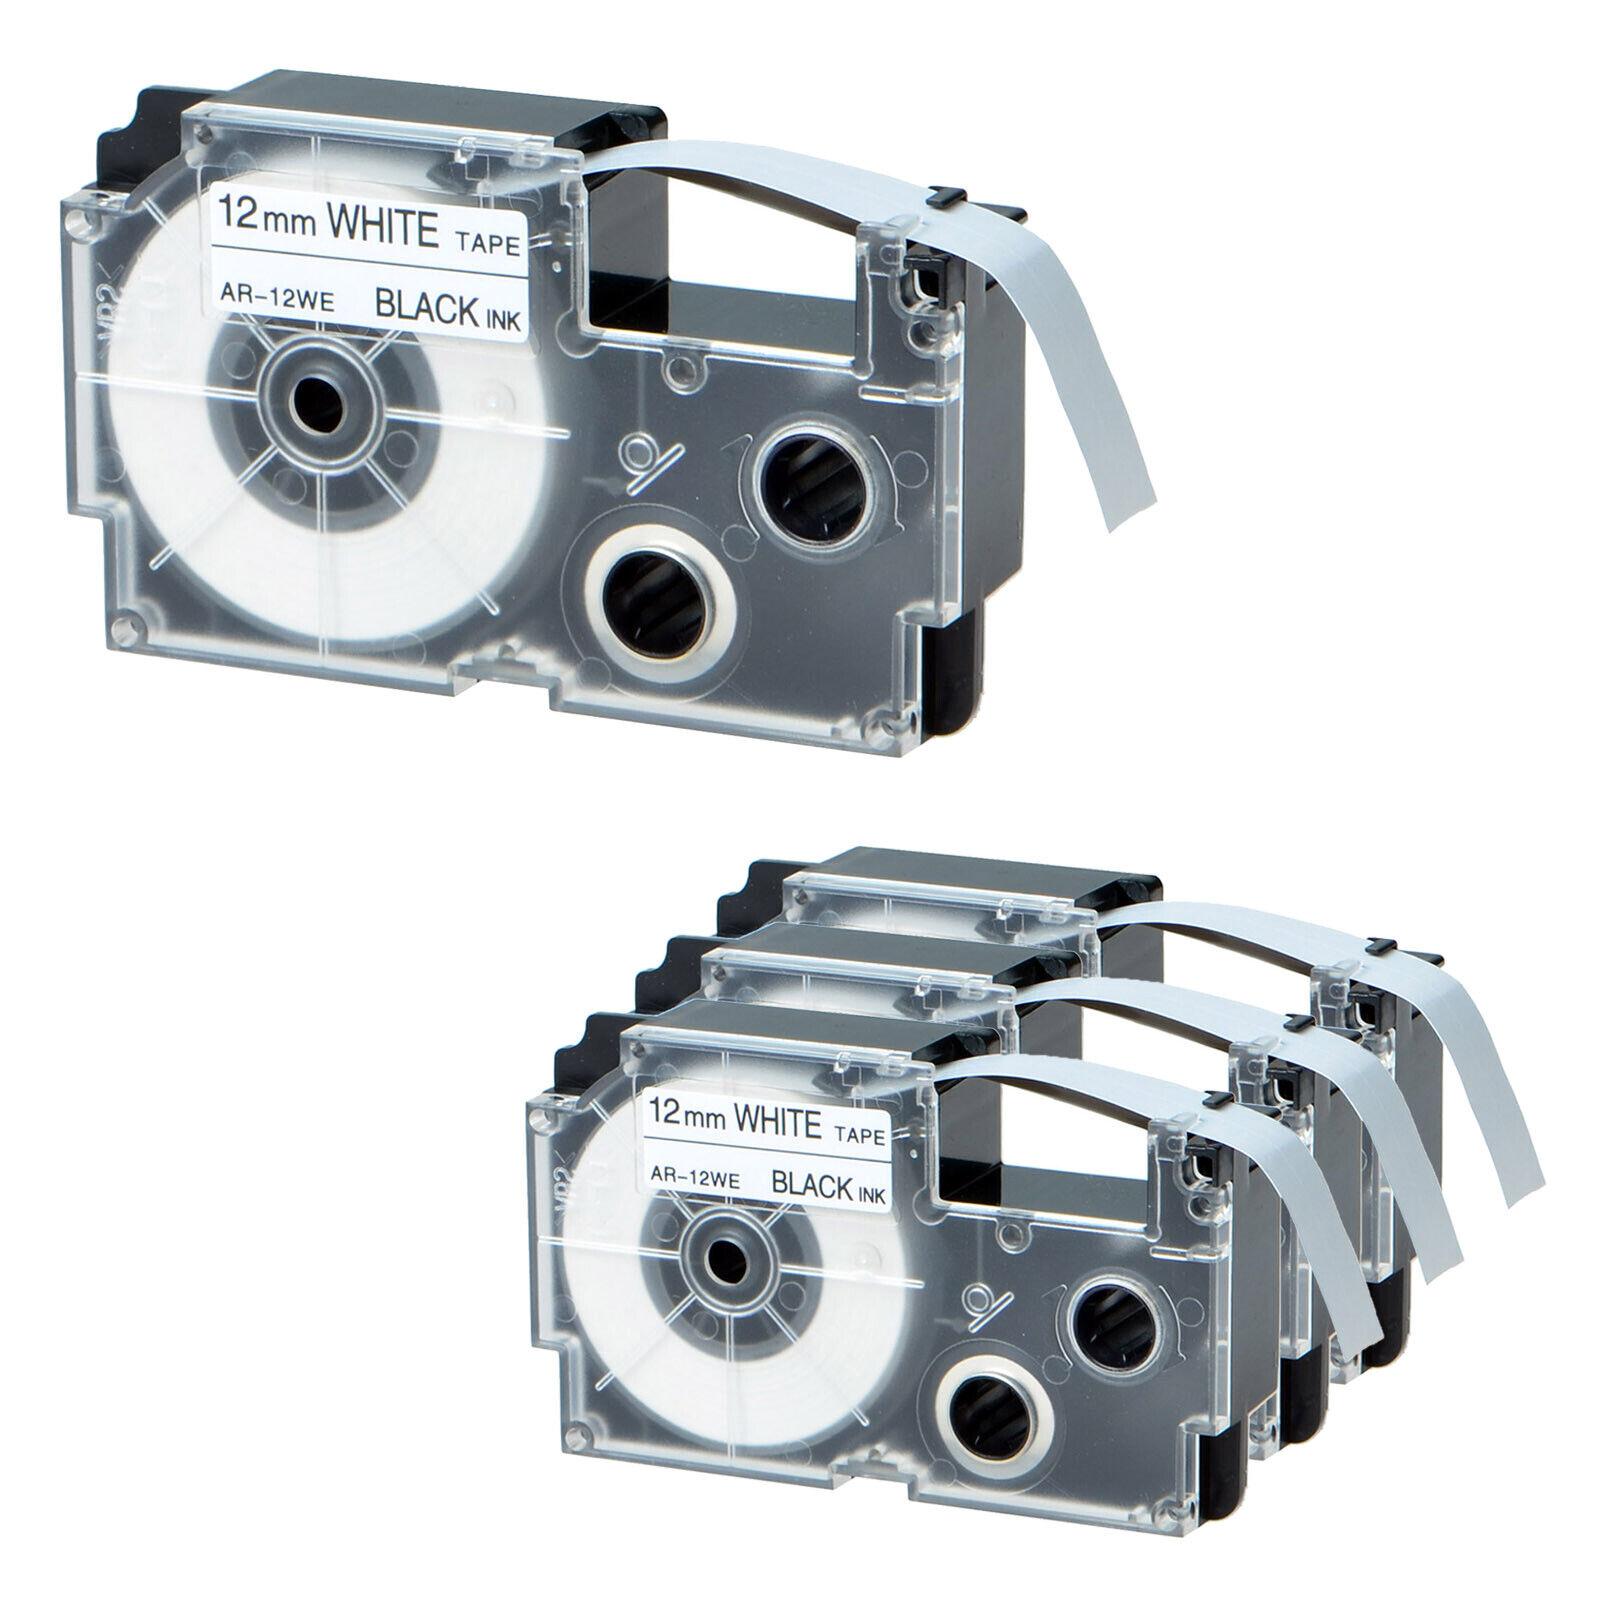 XR-12WE1 Compatible for Casio Tape Black on White 1//2/'/' Label KL100 KL750  2PACK